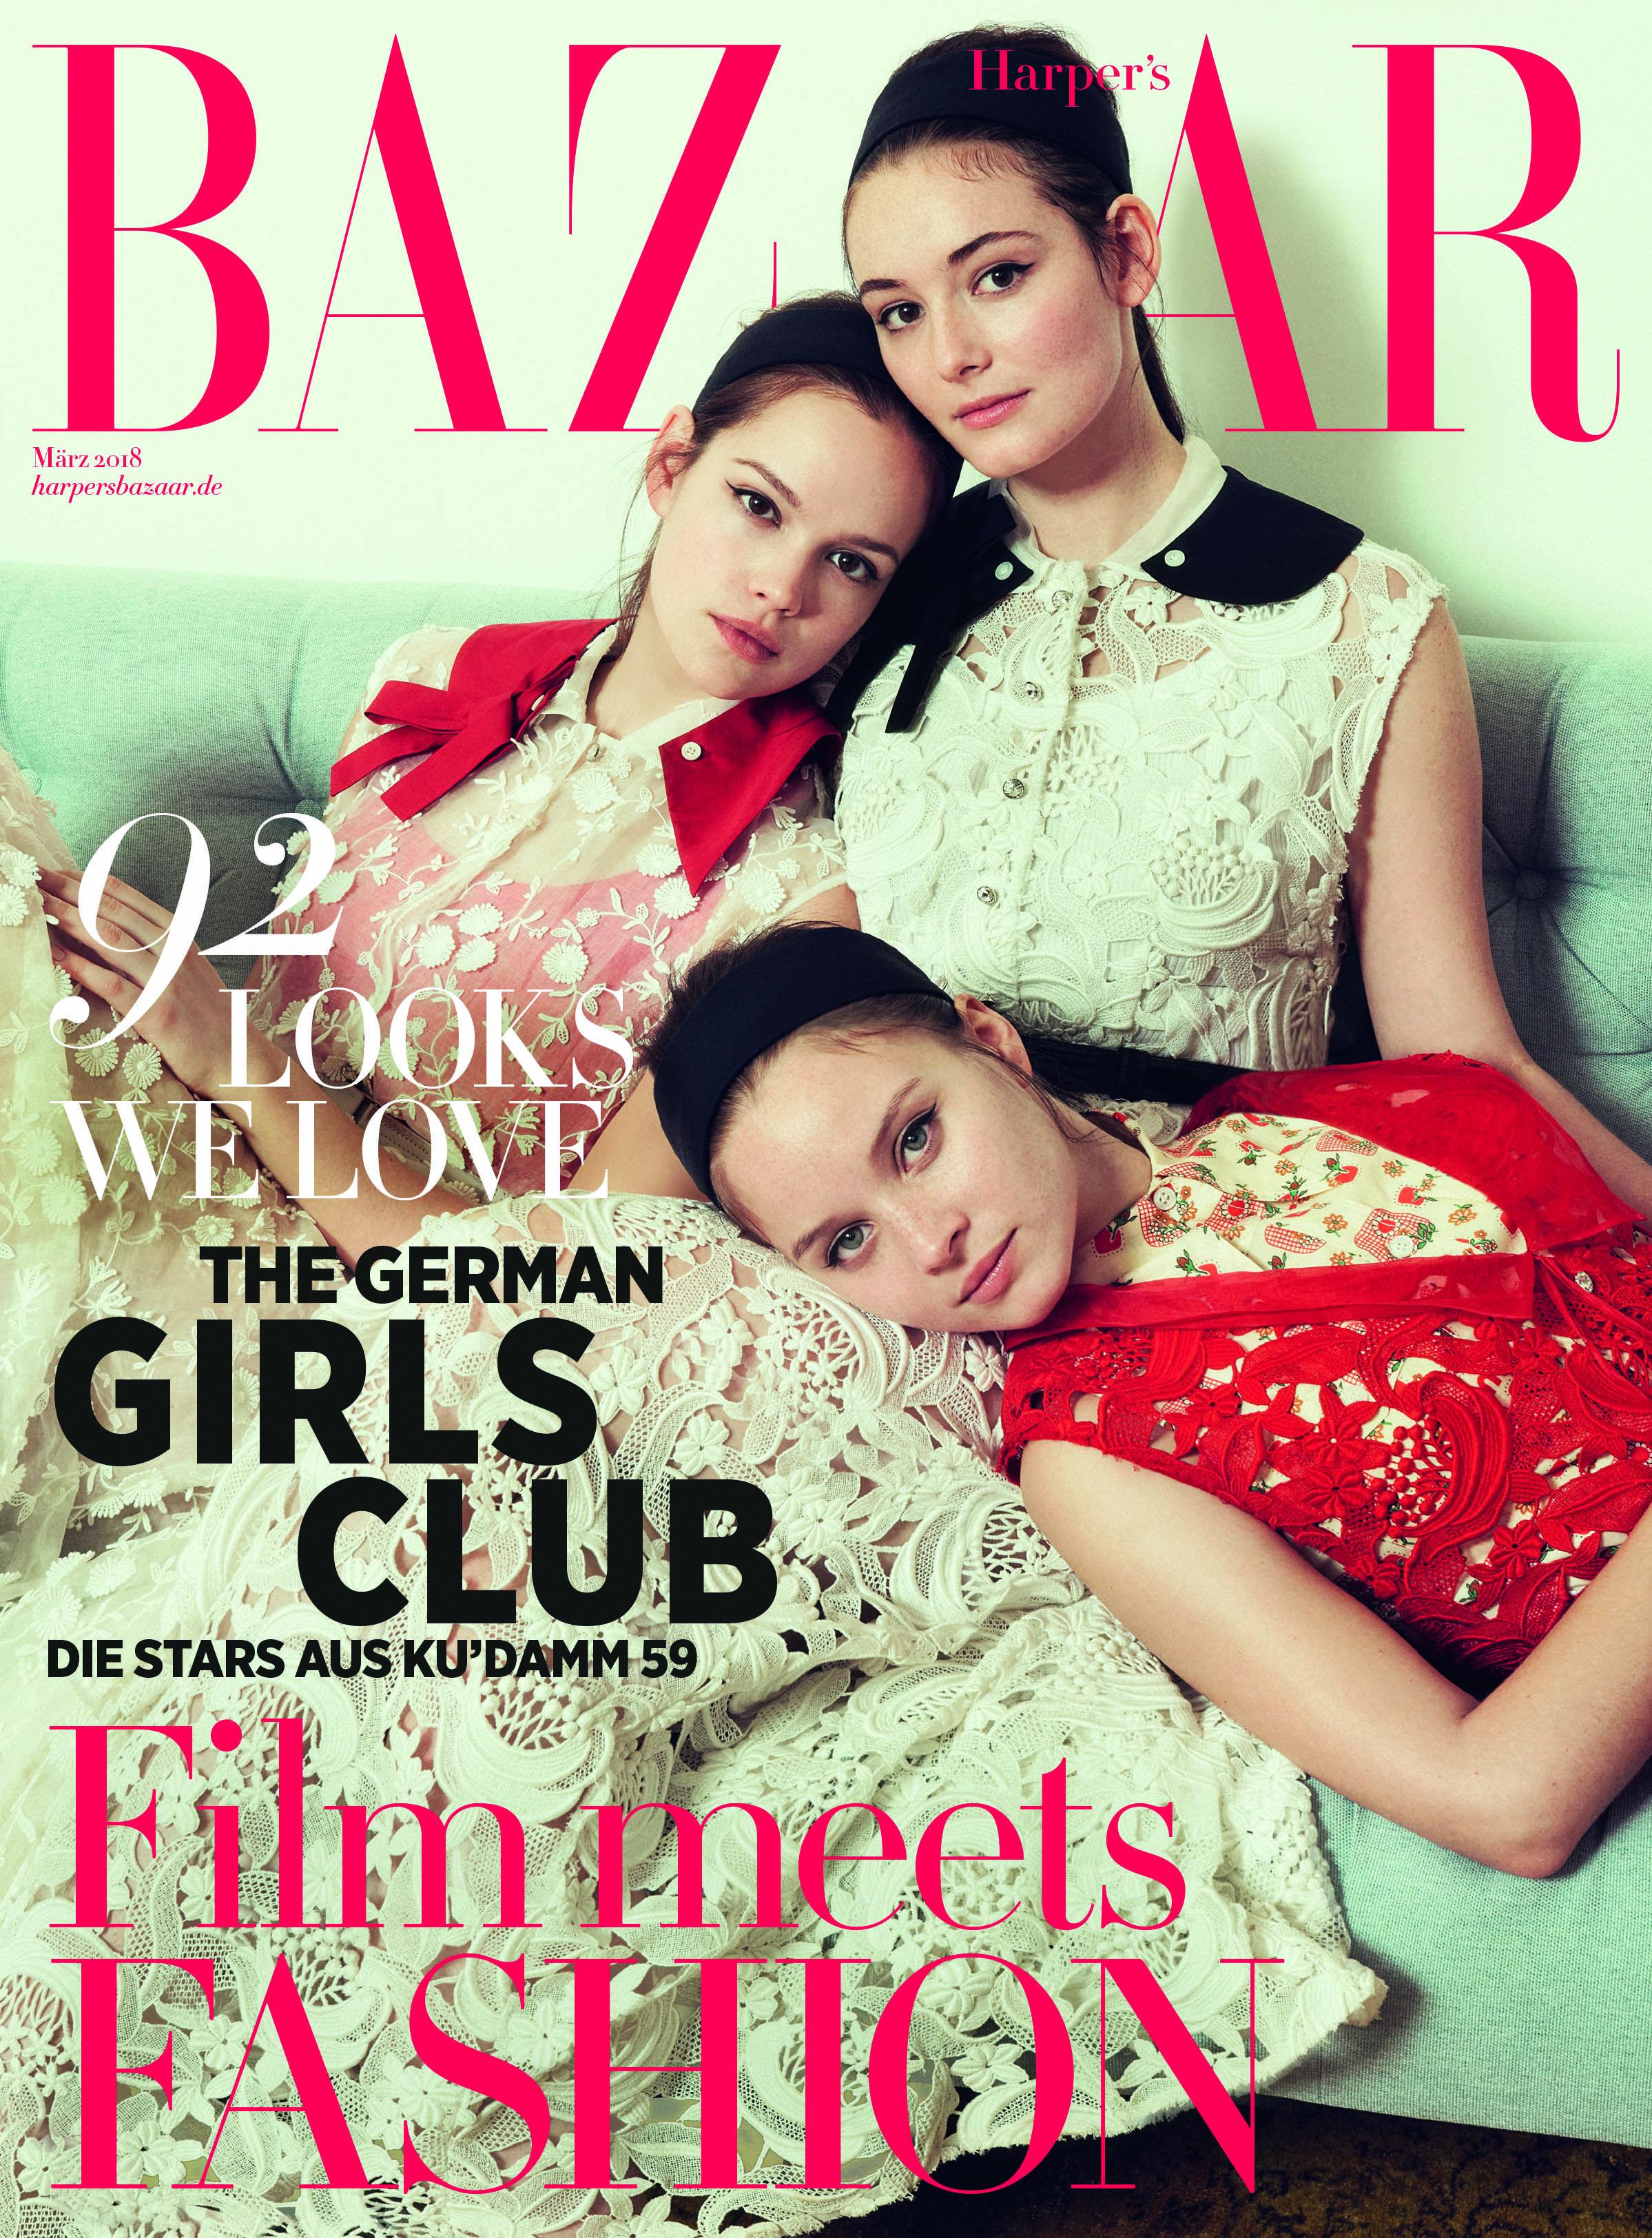 Photo of Harper's BAZAAR: German actresses in the March issue